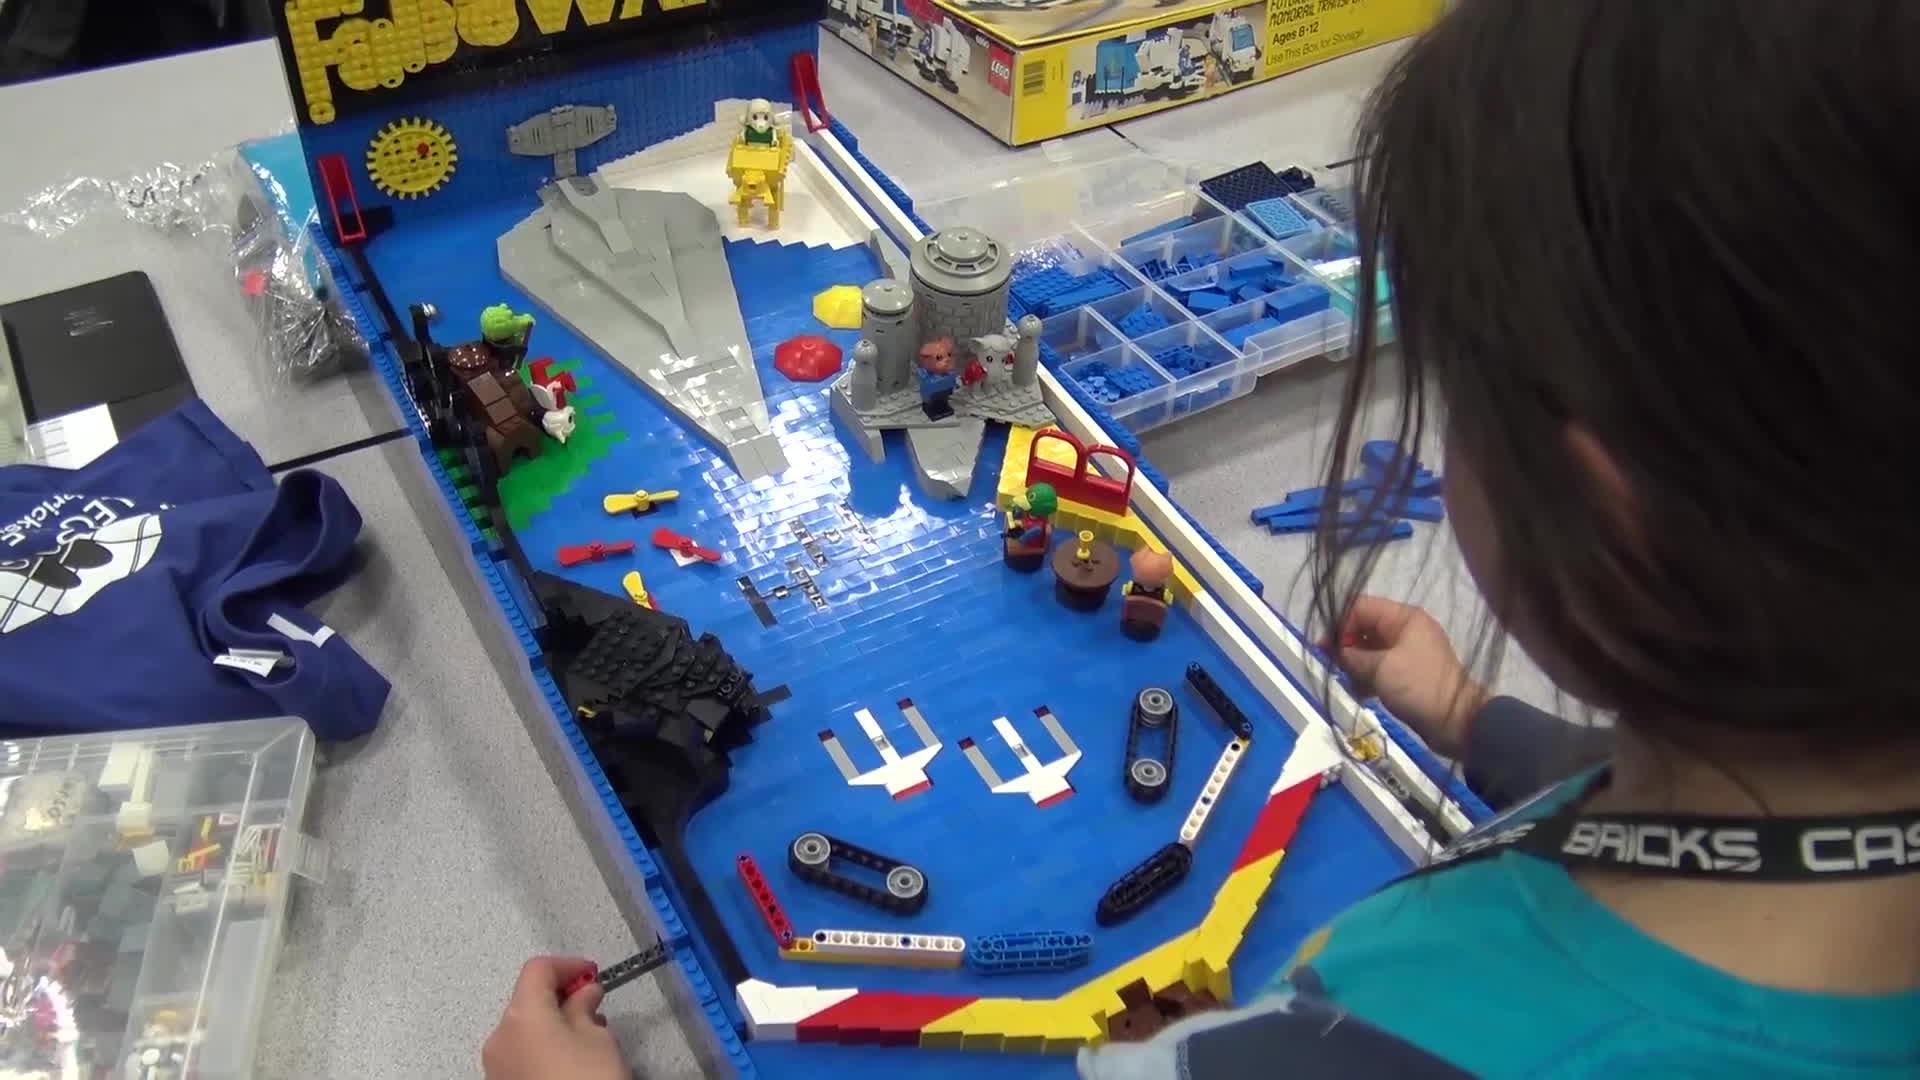 lego, pinball, Functional LEGO Pinball Machine Star Wars / Fabuland GIFs